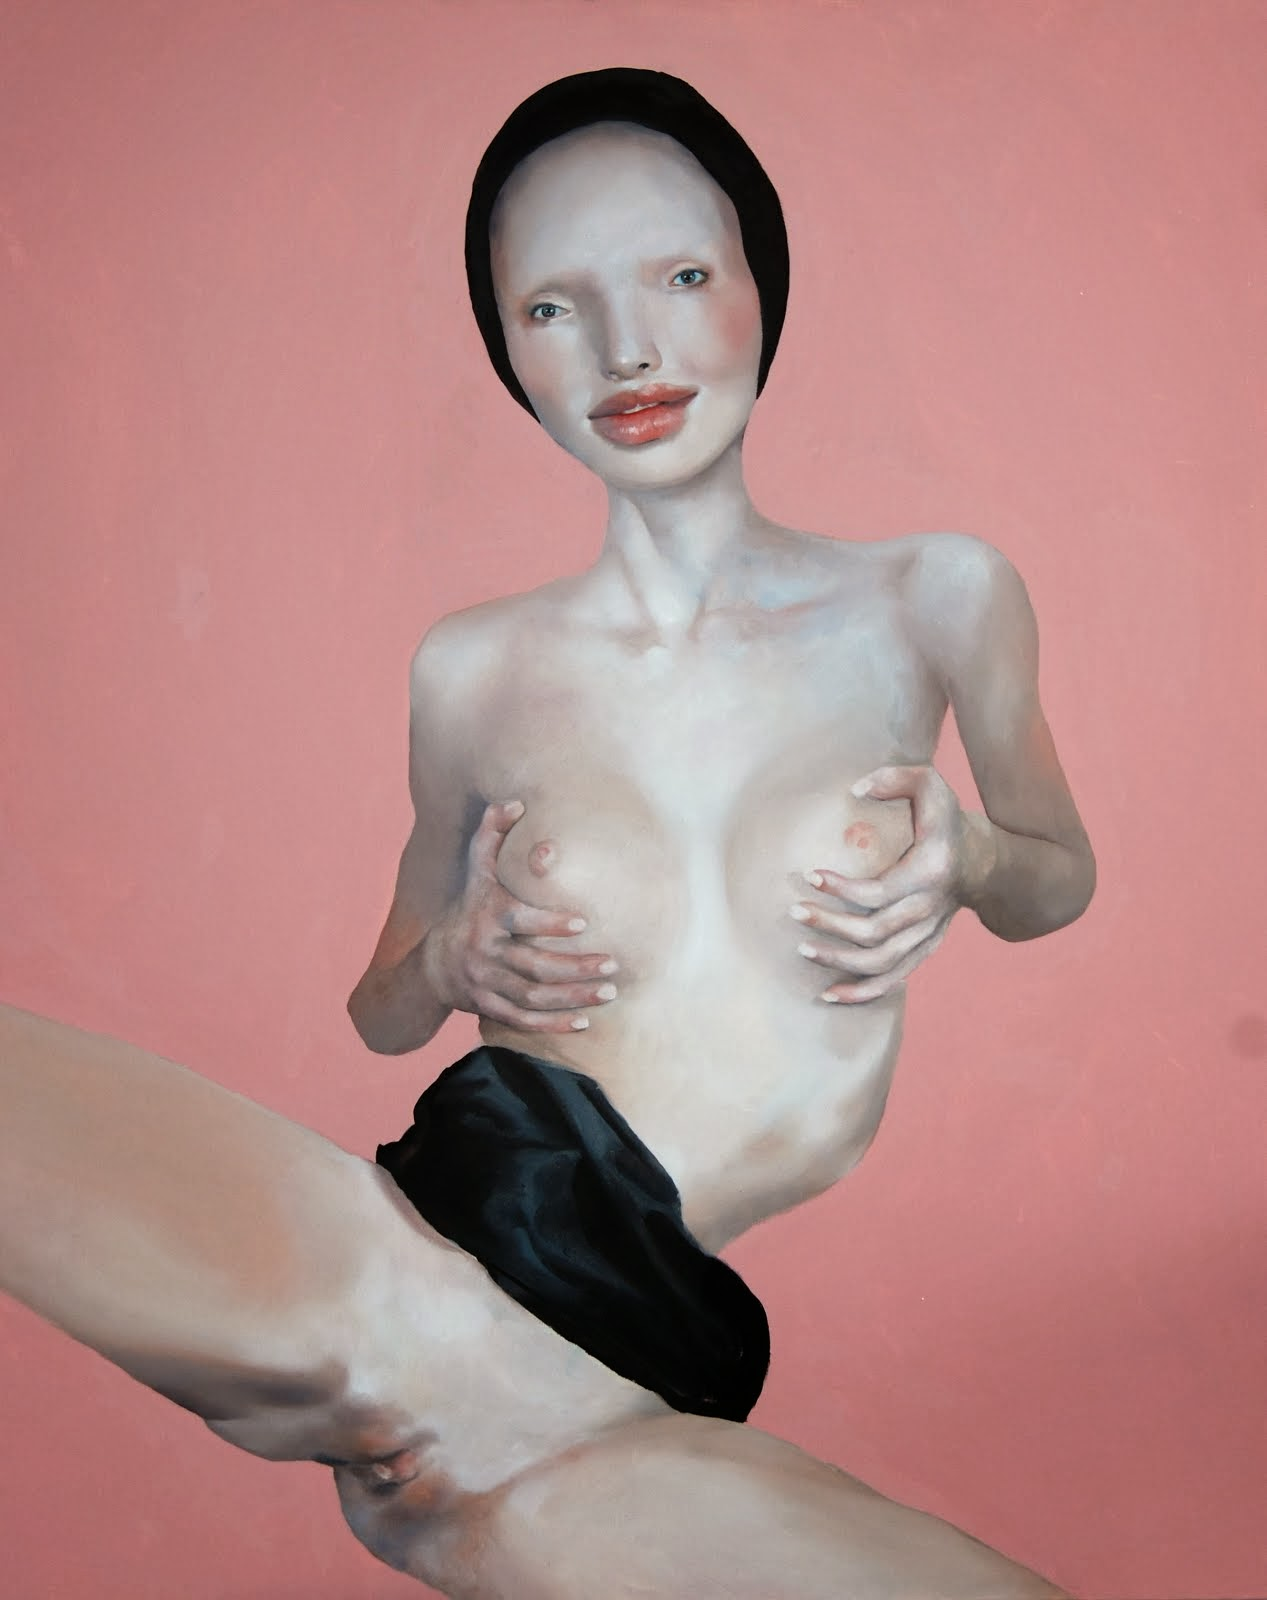 """Pretty Pink"" Juan Palomares Parking Gallery"